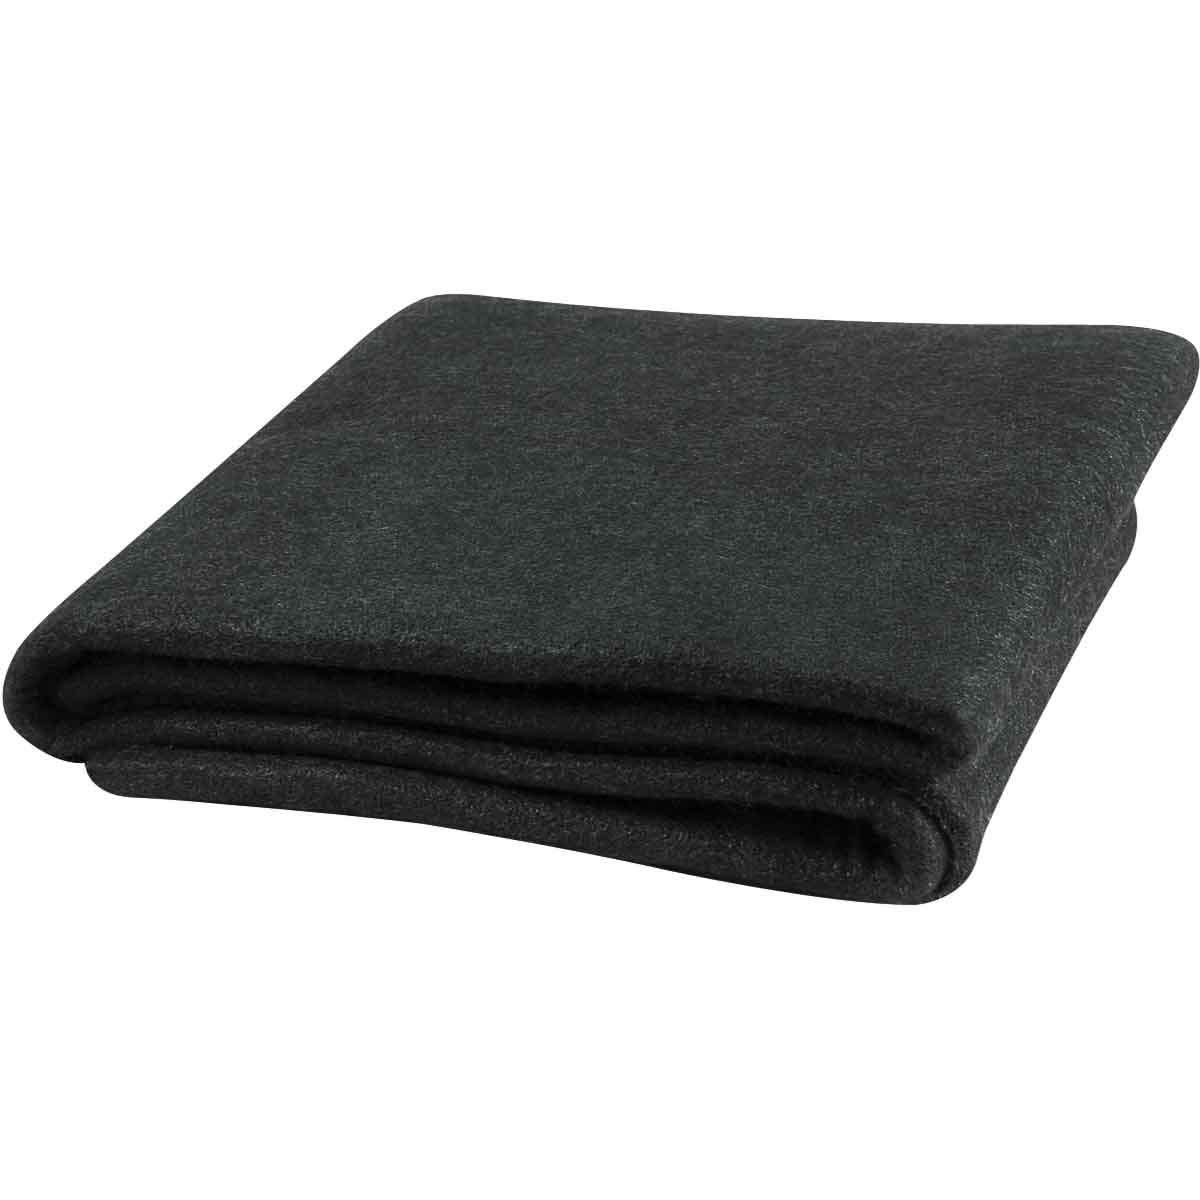 Steiner 316-4X6 Velvet Shield 16 oz Black Carbonized Fiber Welding Blanket, 4' x 6' by Steiner